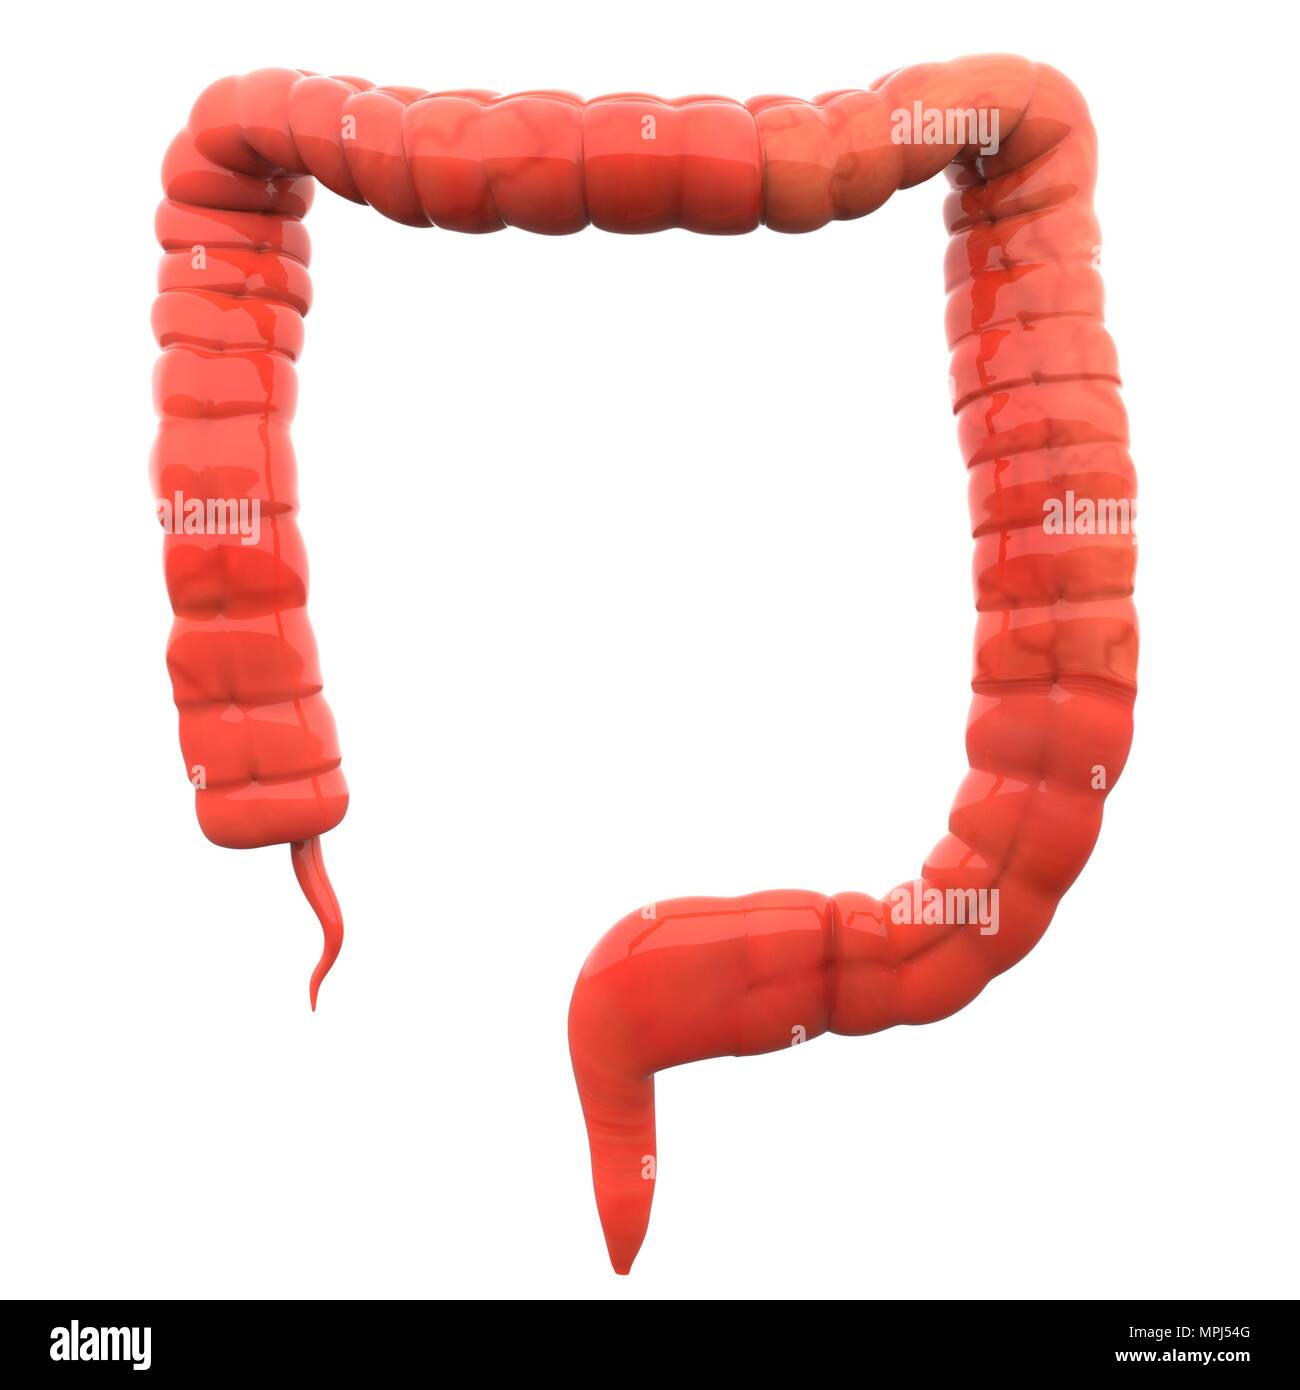 Human Digestive System Large Intestine Anatomy Stock Photo